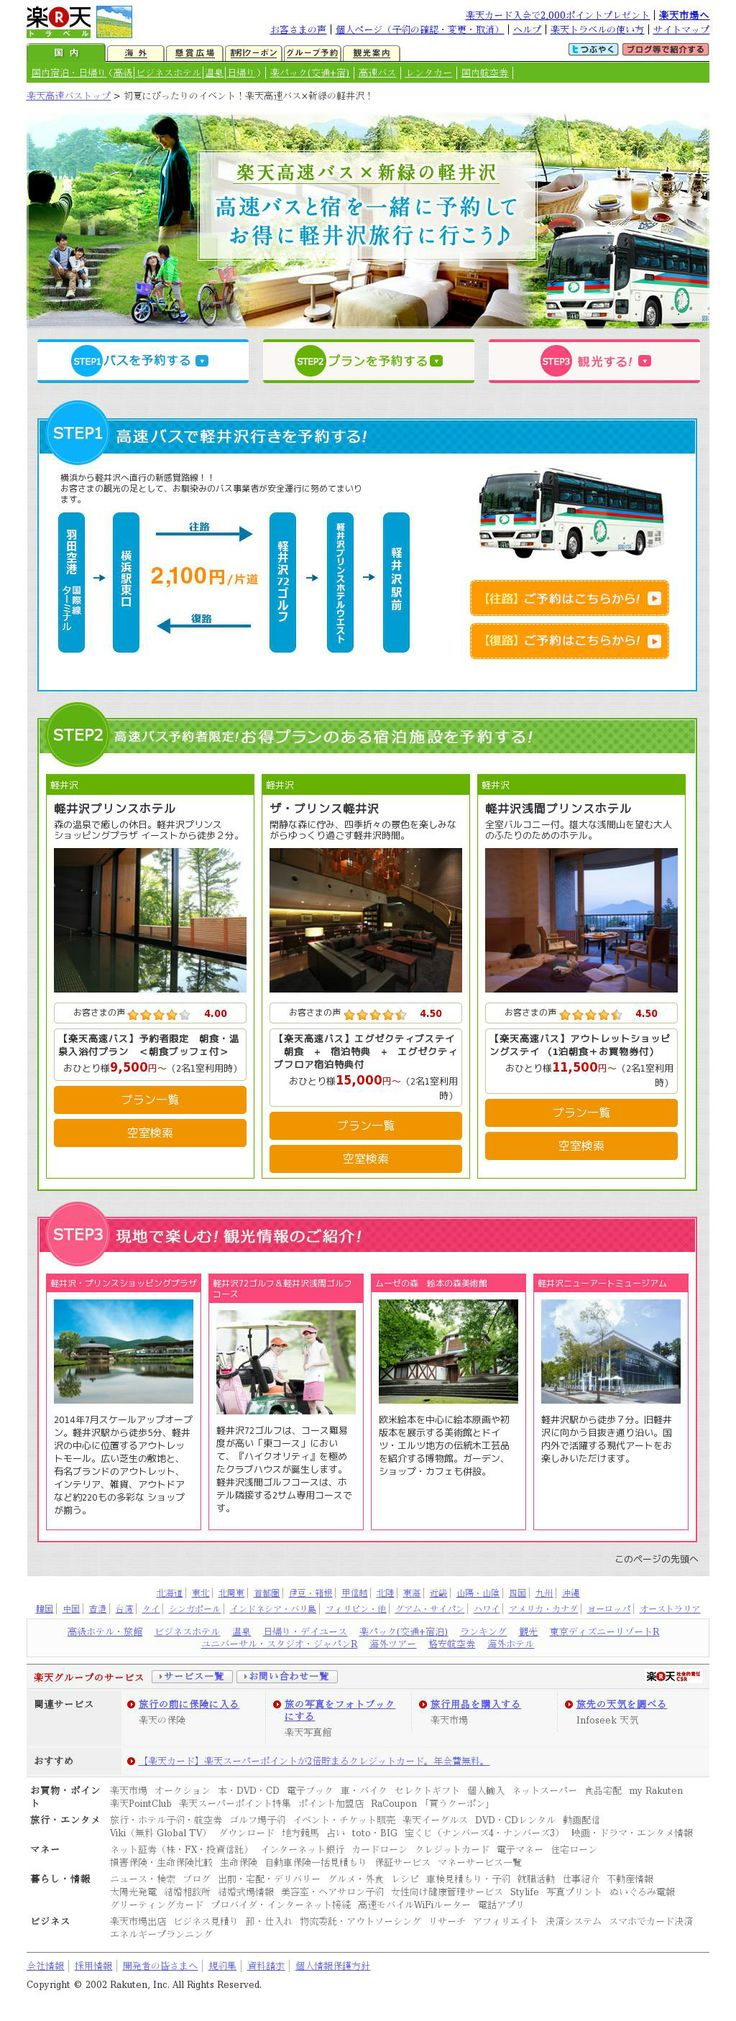 2014/5/29【D】【高速バスG×甲信越G】軽井沢ページ作成依頼